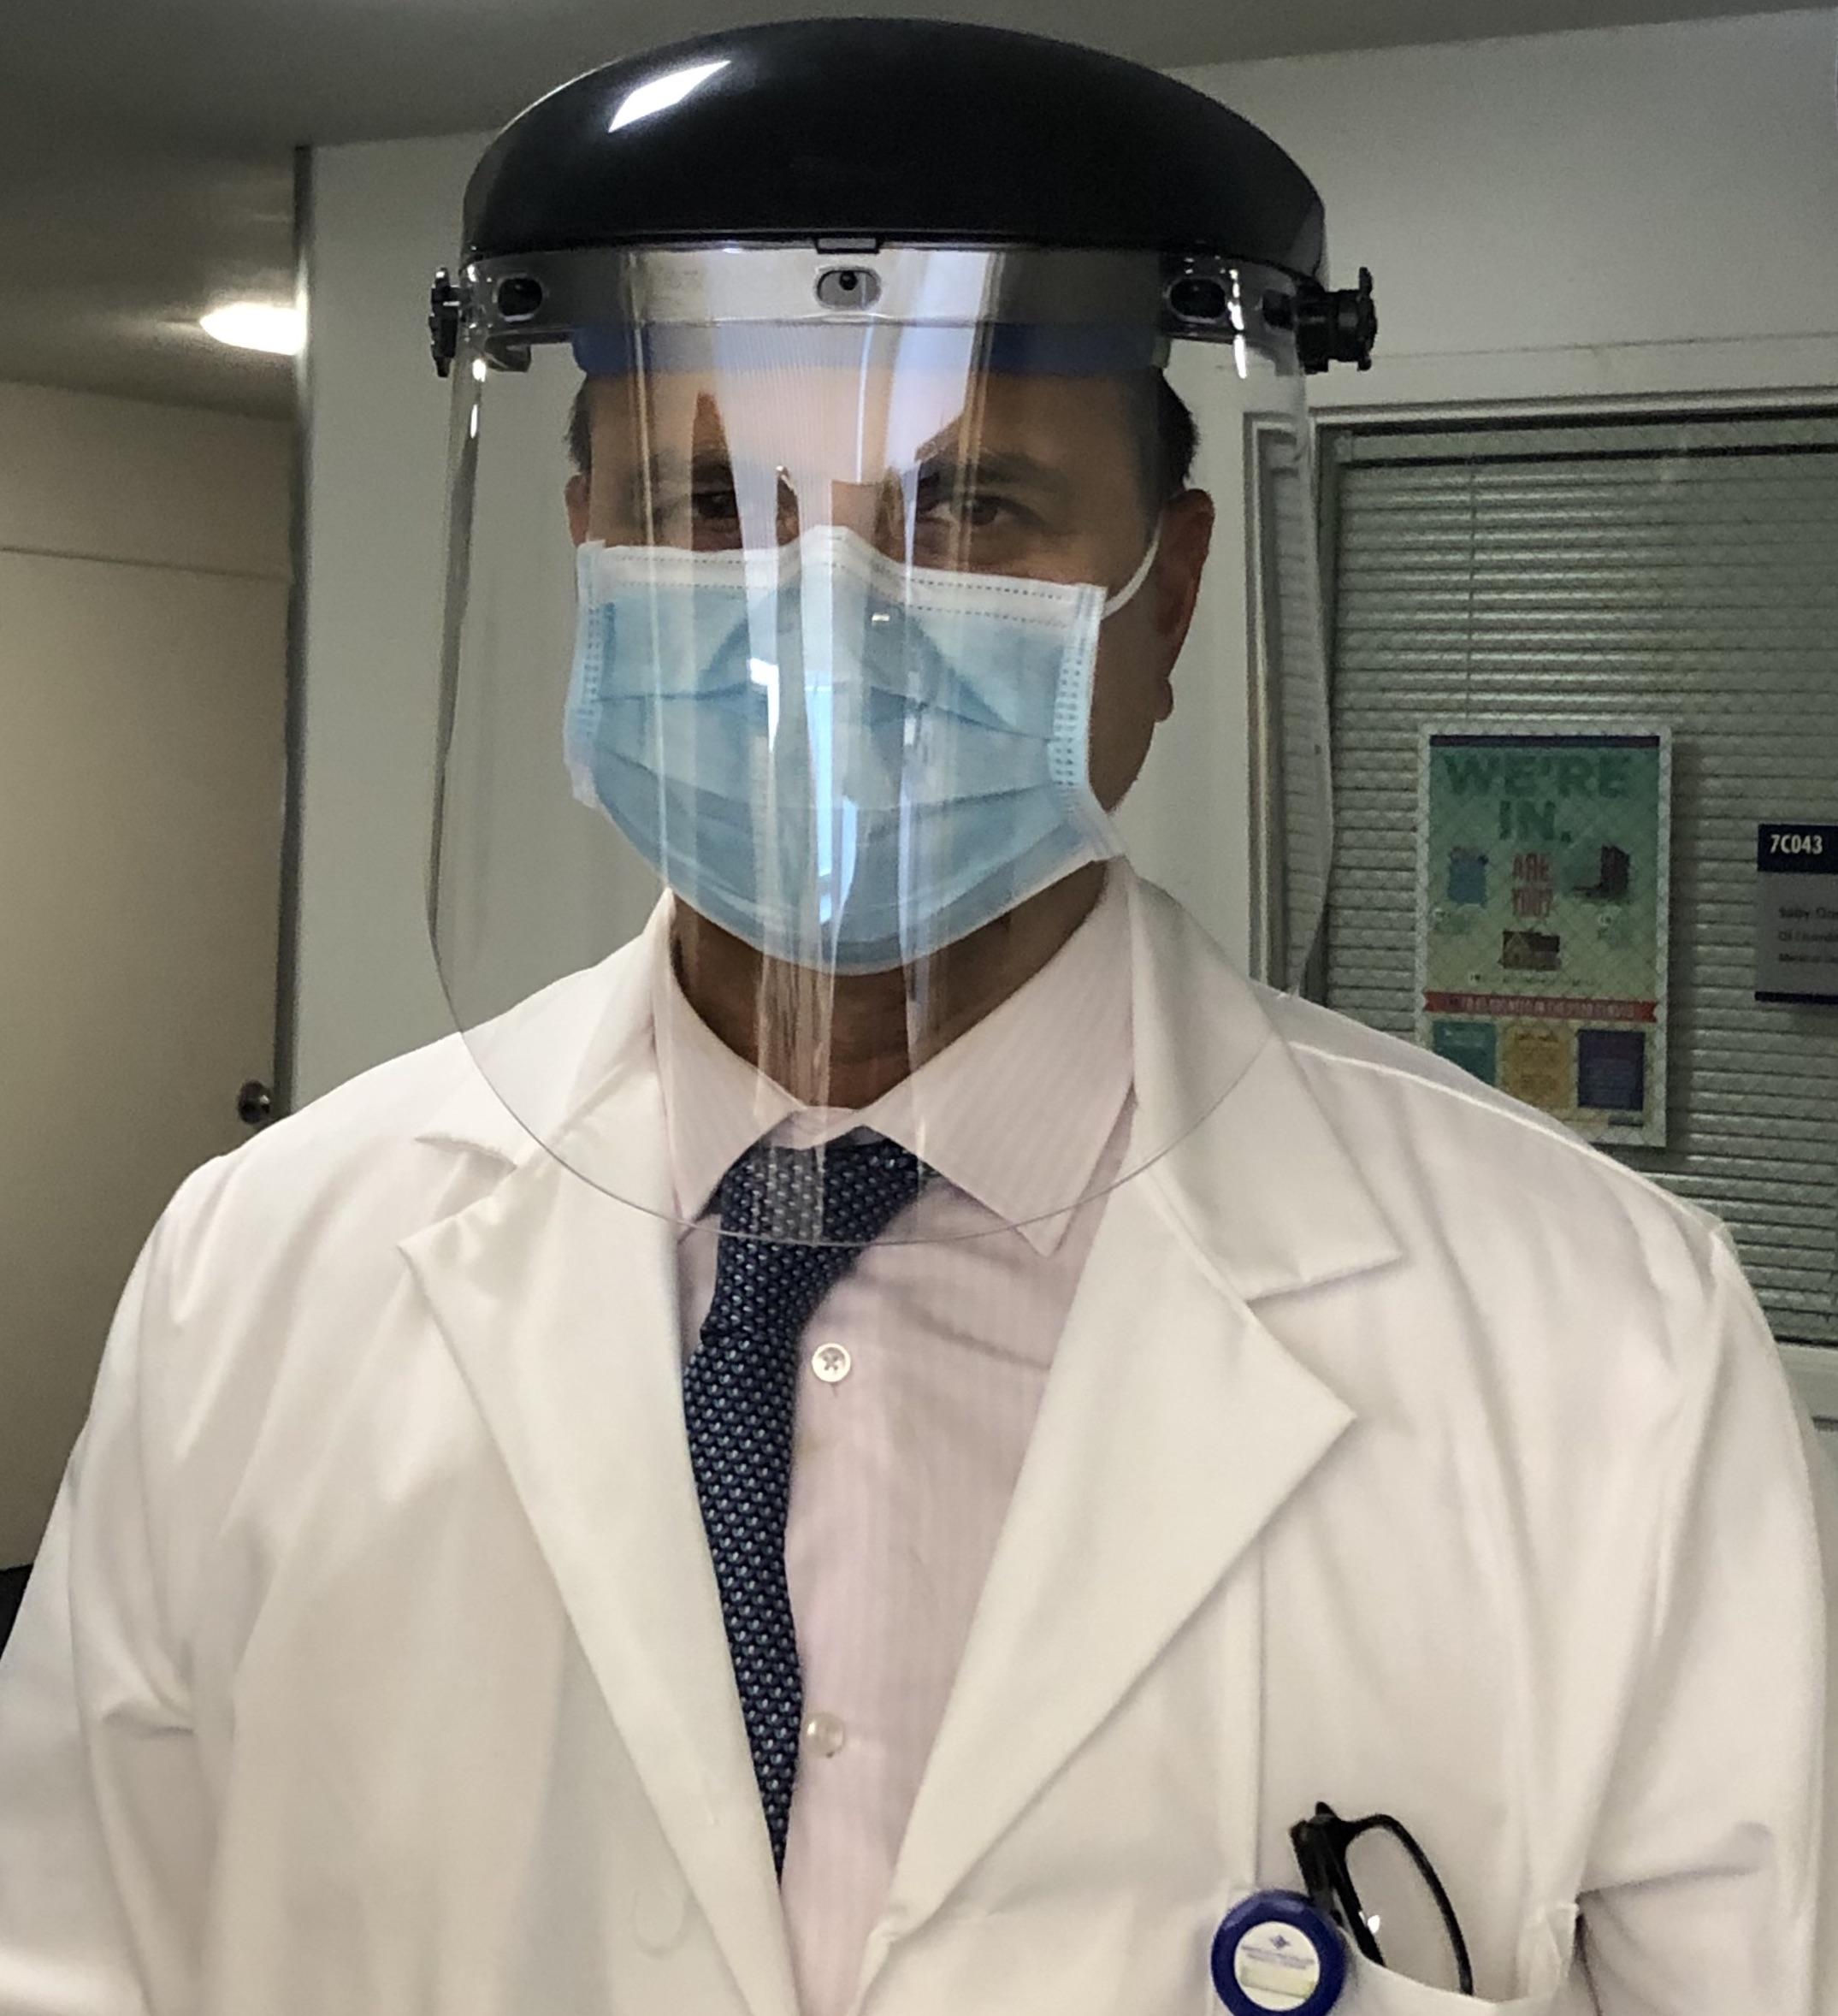 Dr. Sanjay Kurani, hospital medical director at the Santa Clara Valley Medical Center, models a plastic face shield worn over a surgical mask.